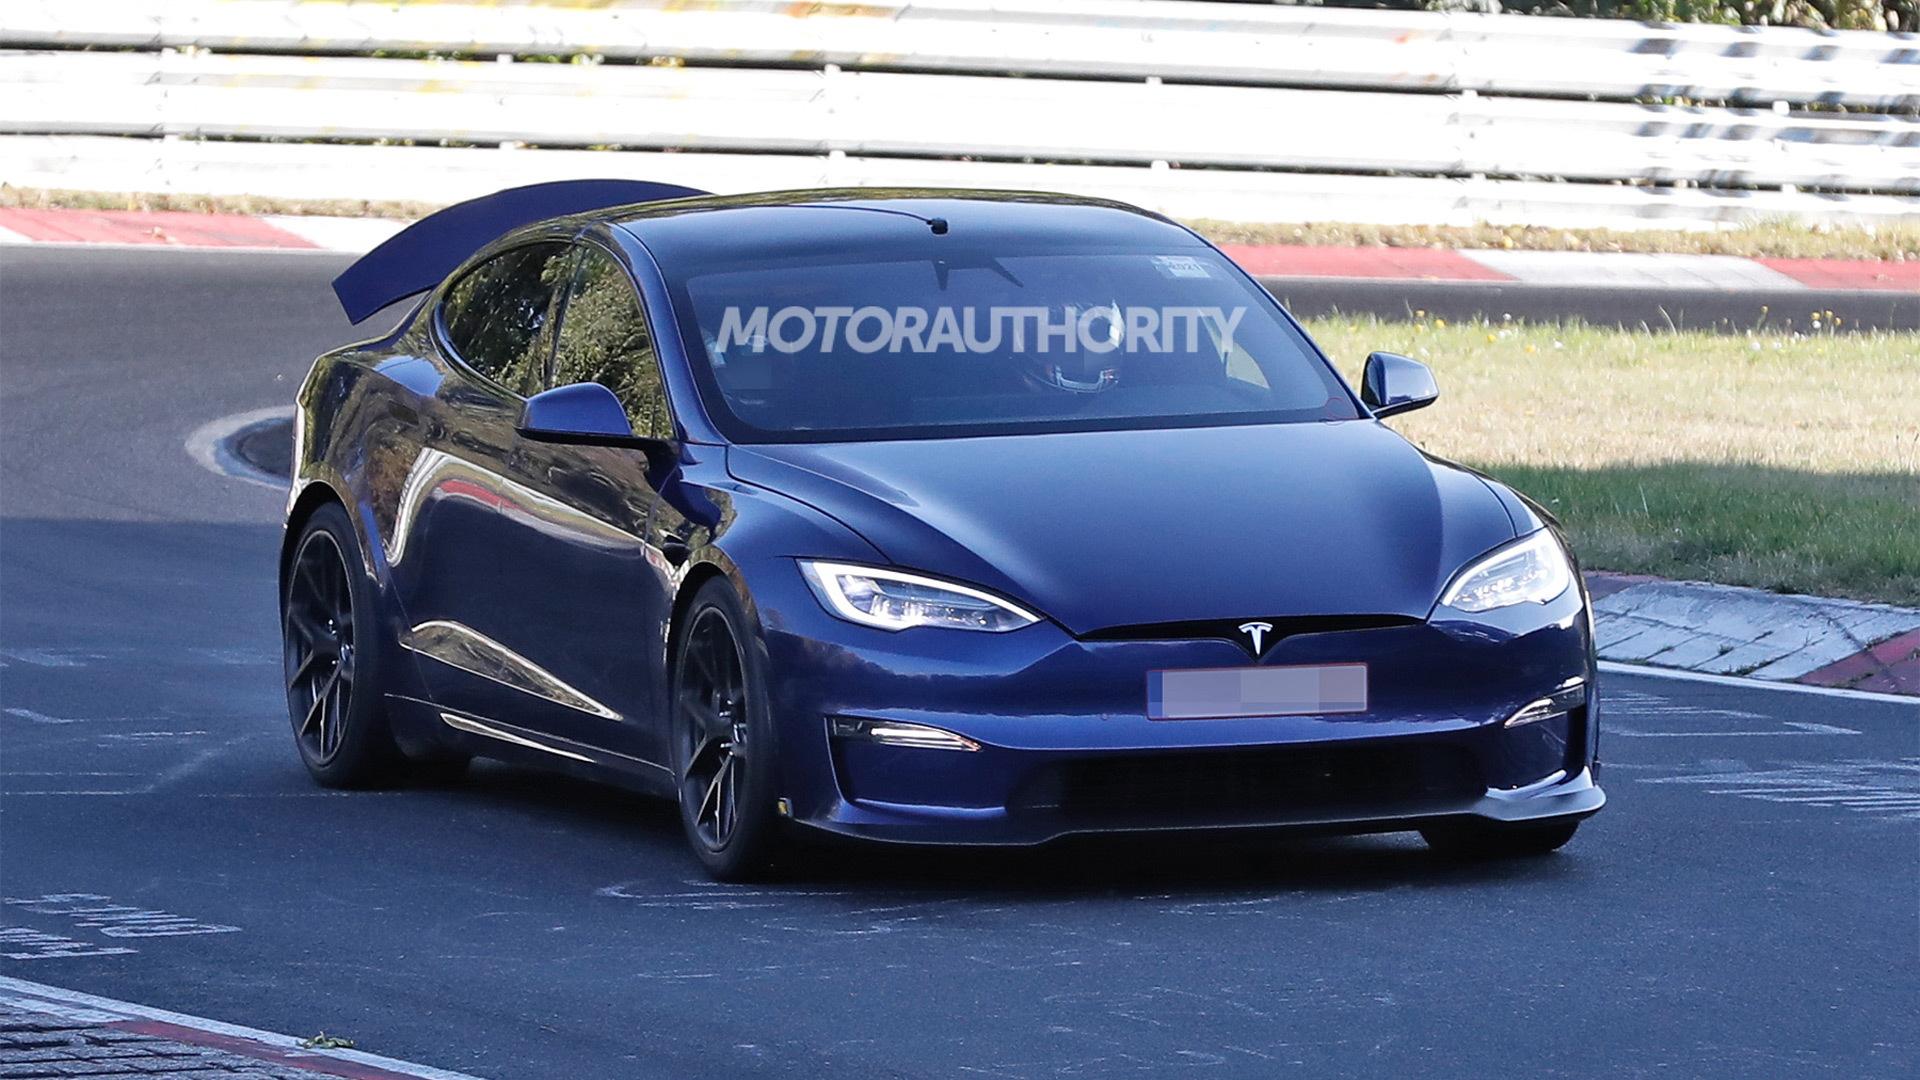 2021 Tesla Model S Plaid with active aero spy shots - Photo credit:S. Baldauf/SB-Medien